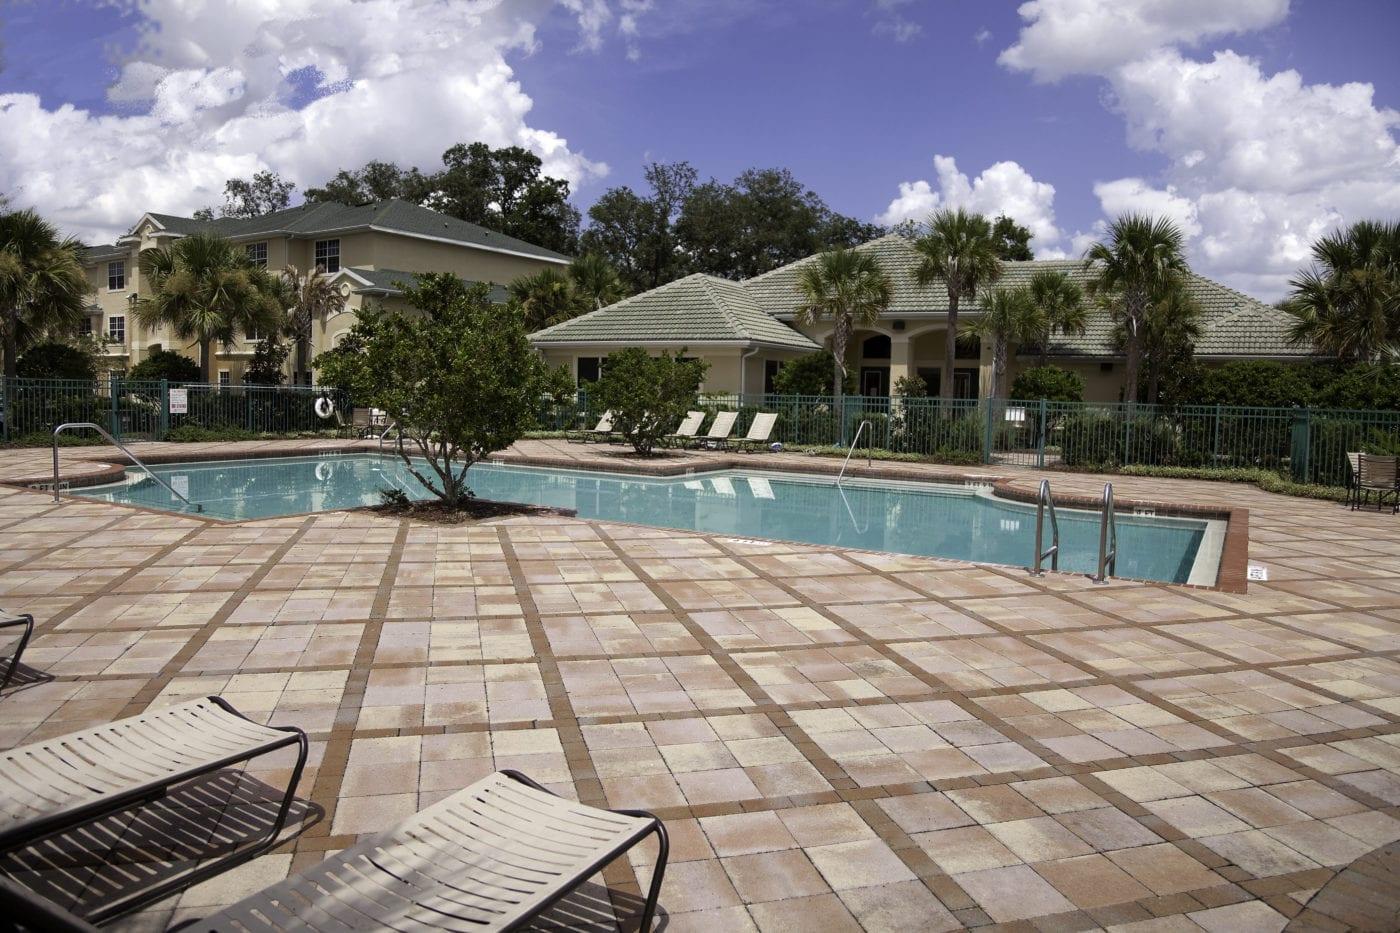 Clarcona Groves Apartments